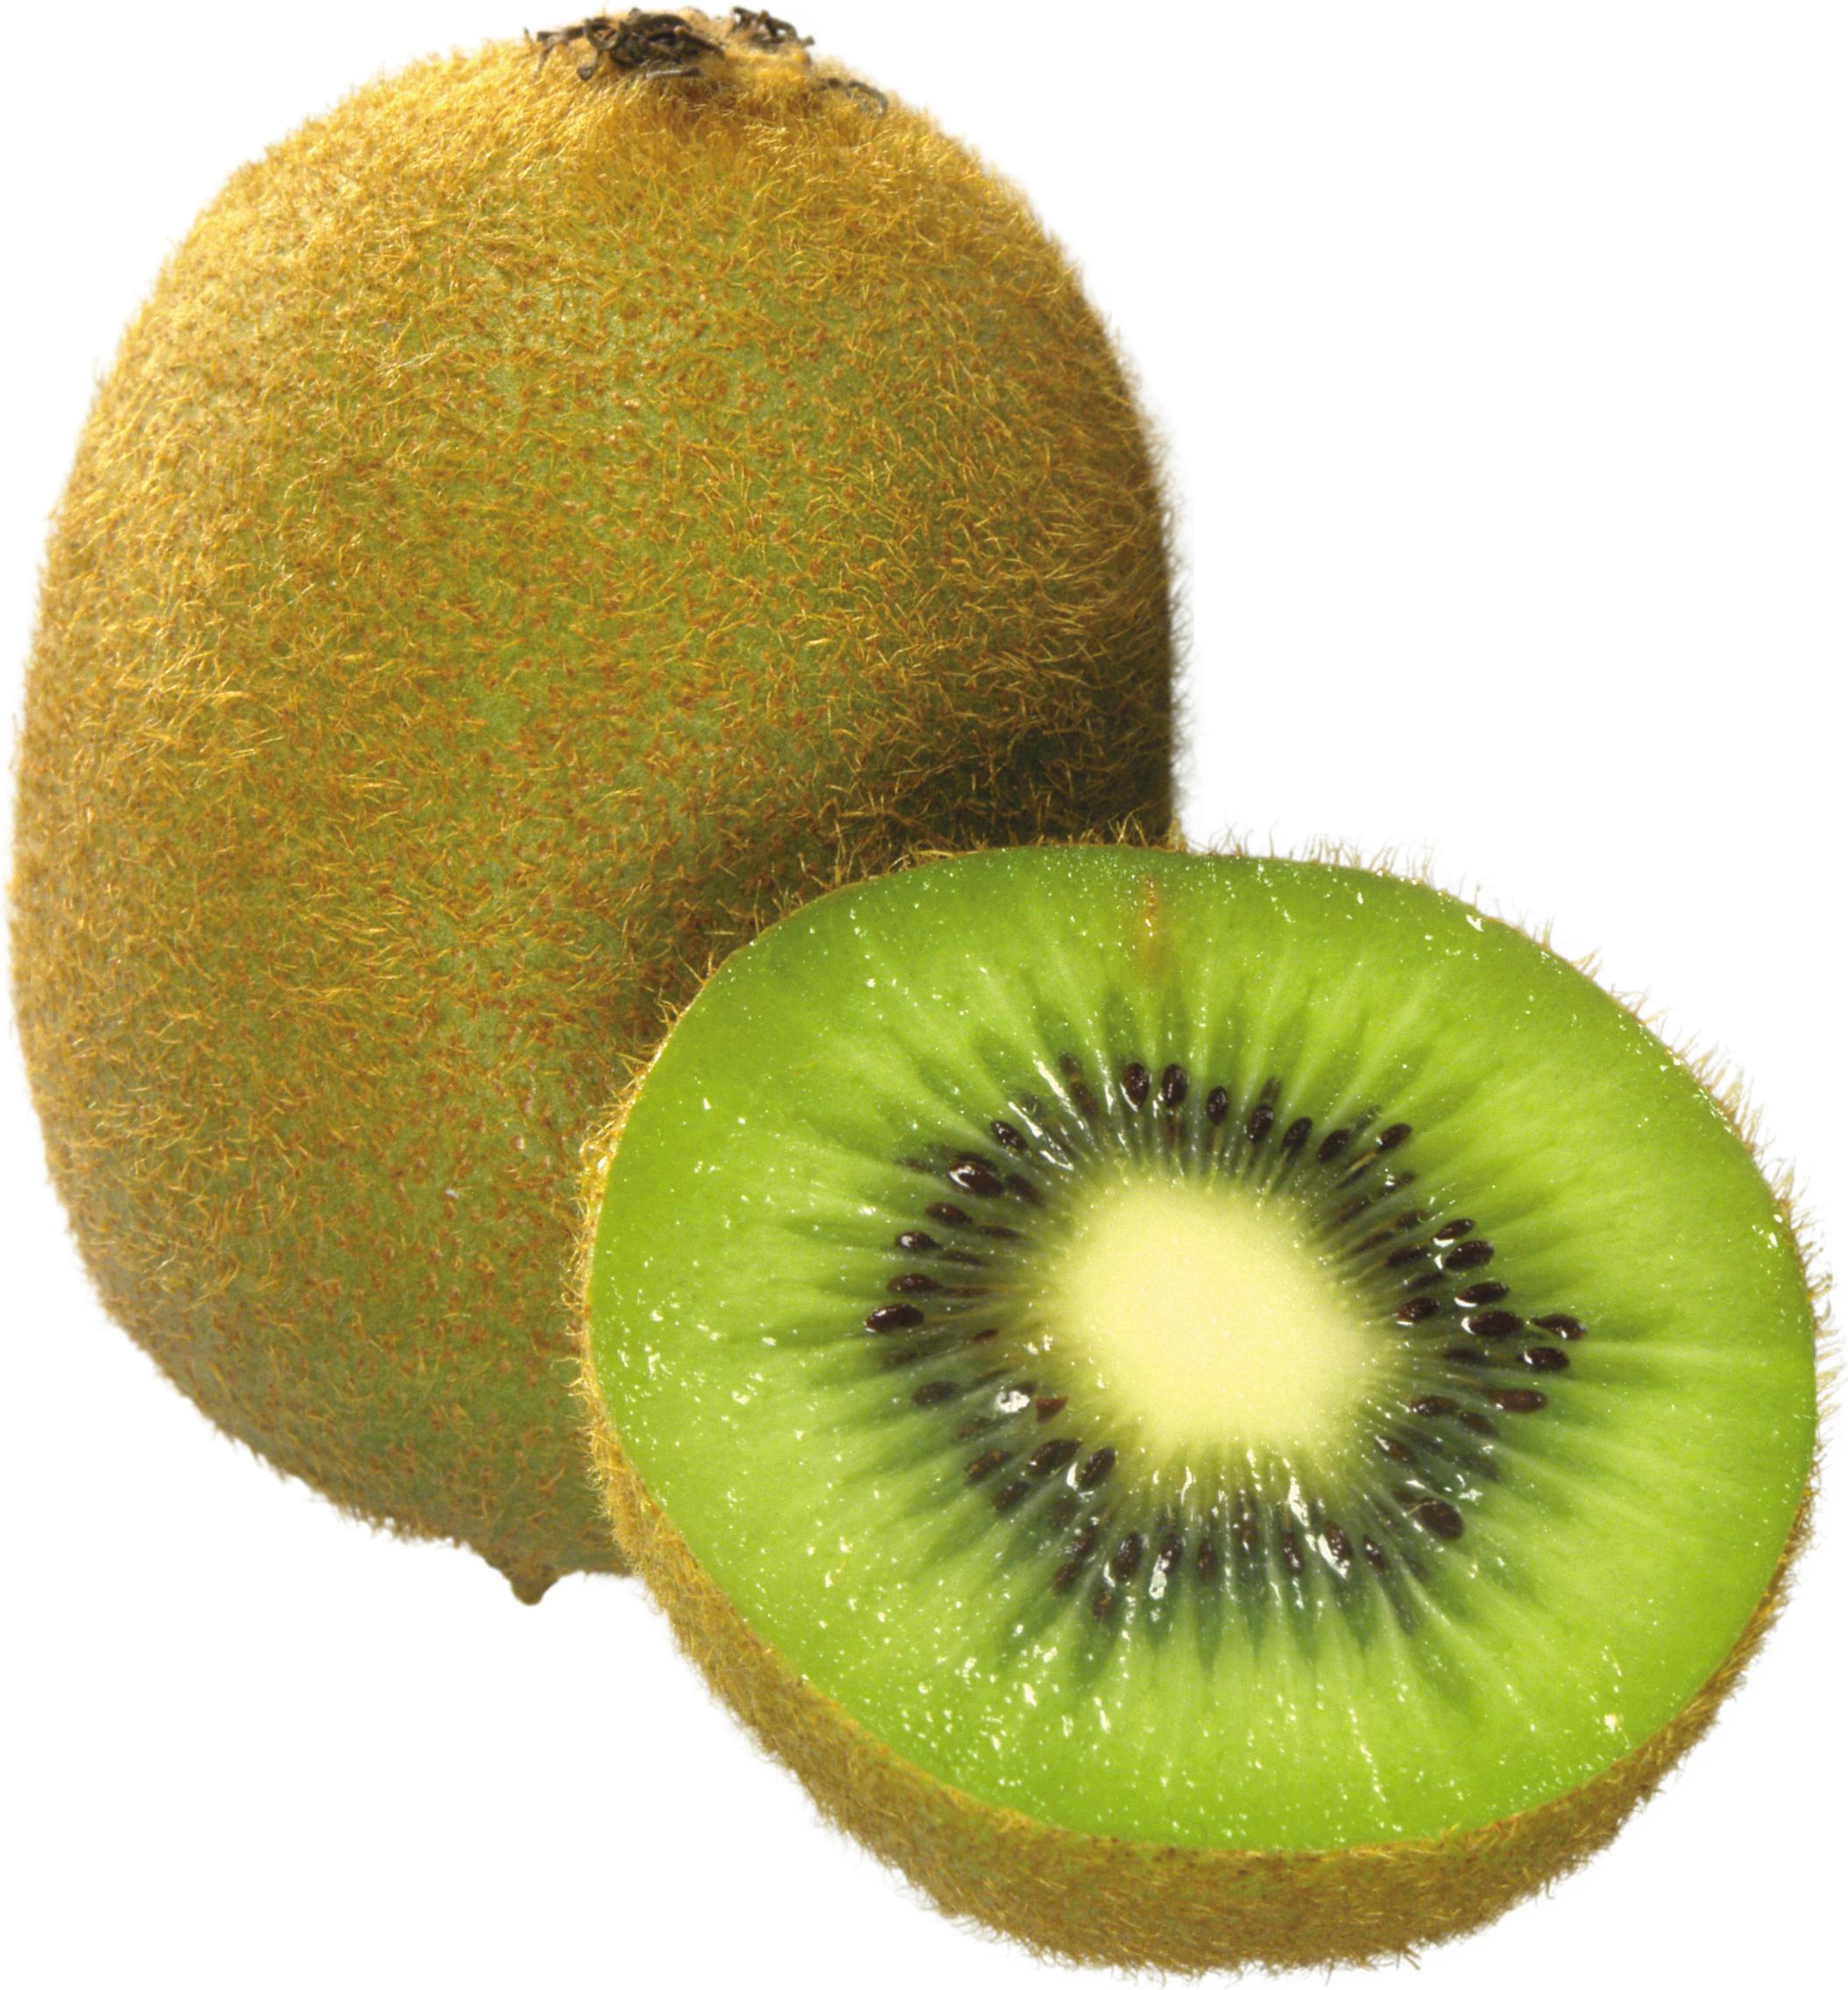 Png image purepng free. Kiwi clipart transparent background